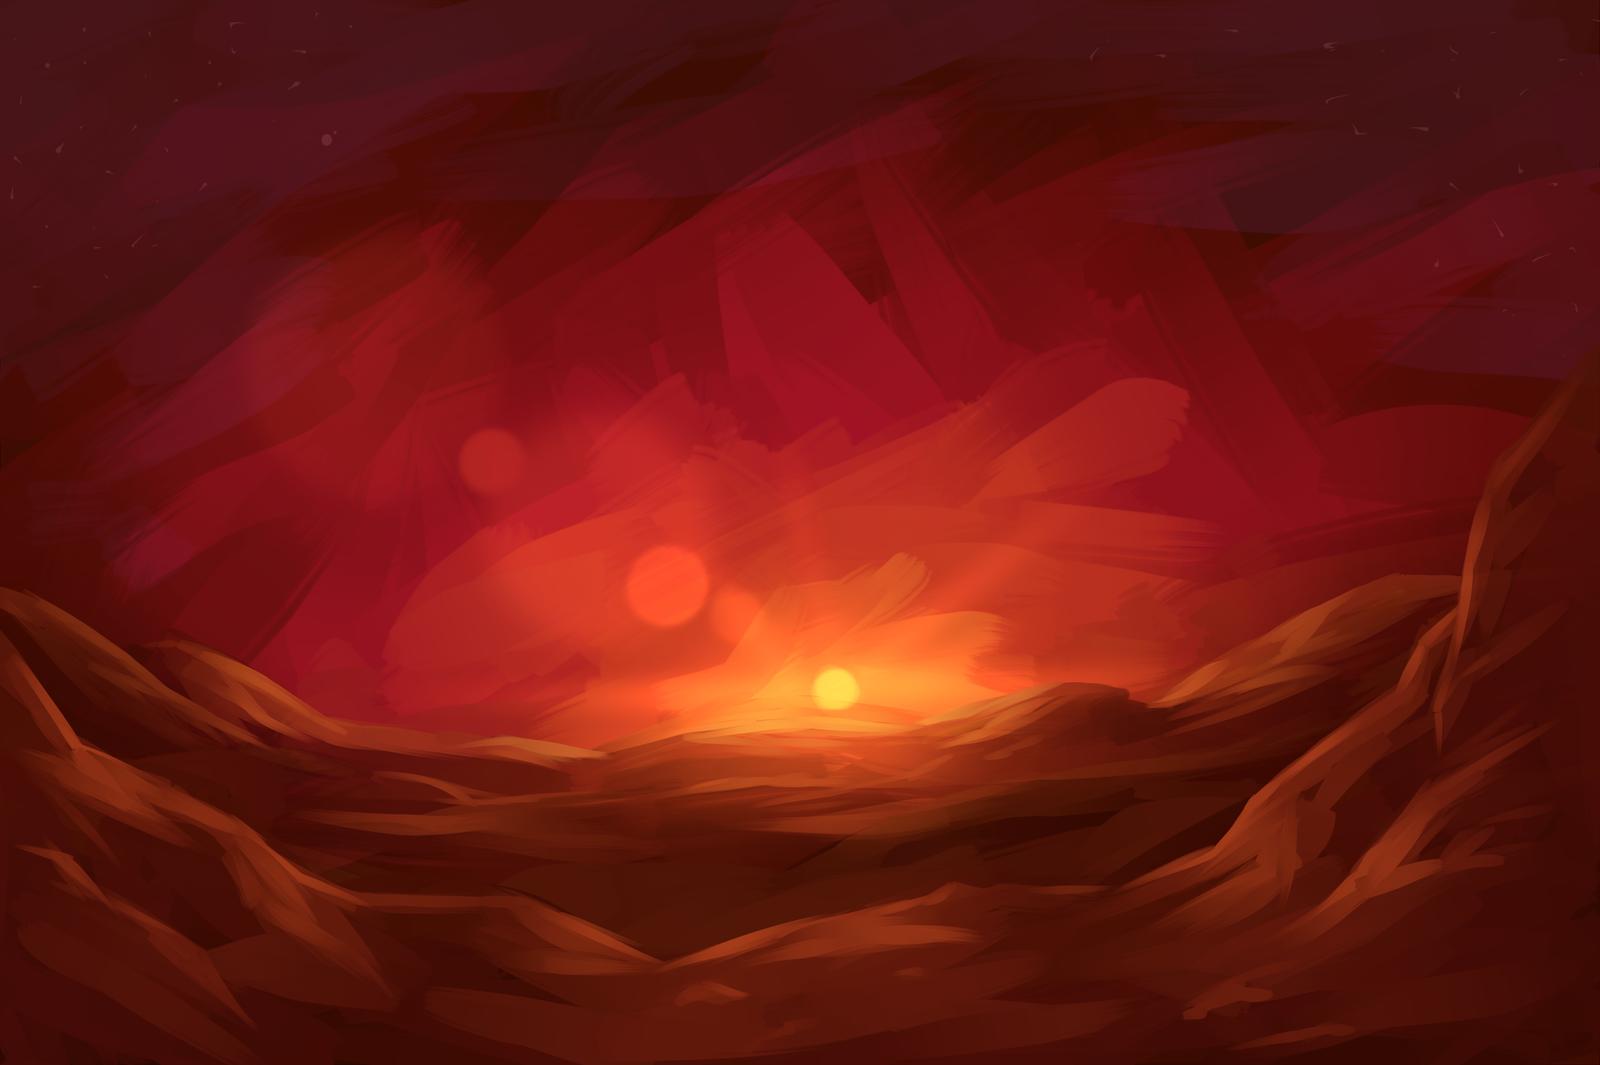 Martian sunset by know kname on deviantart - Mars sunset wallpaper ...